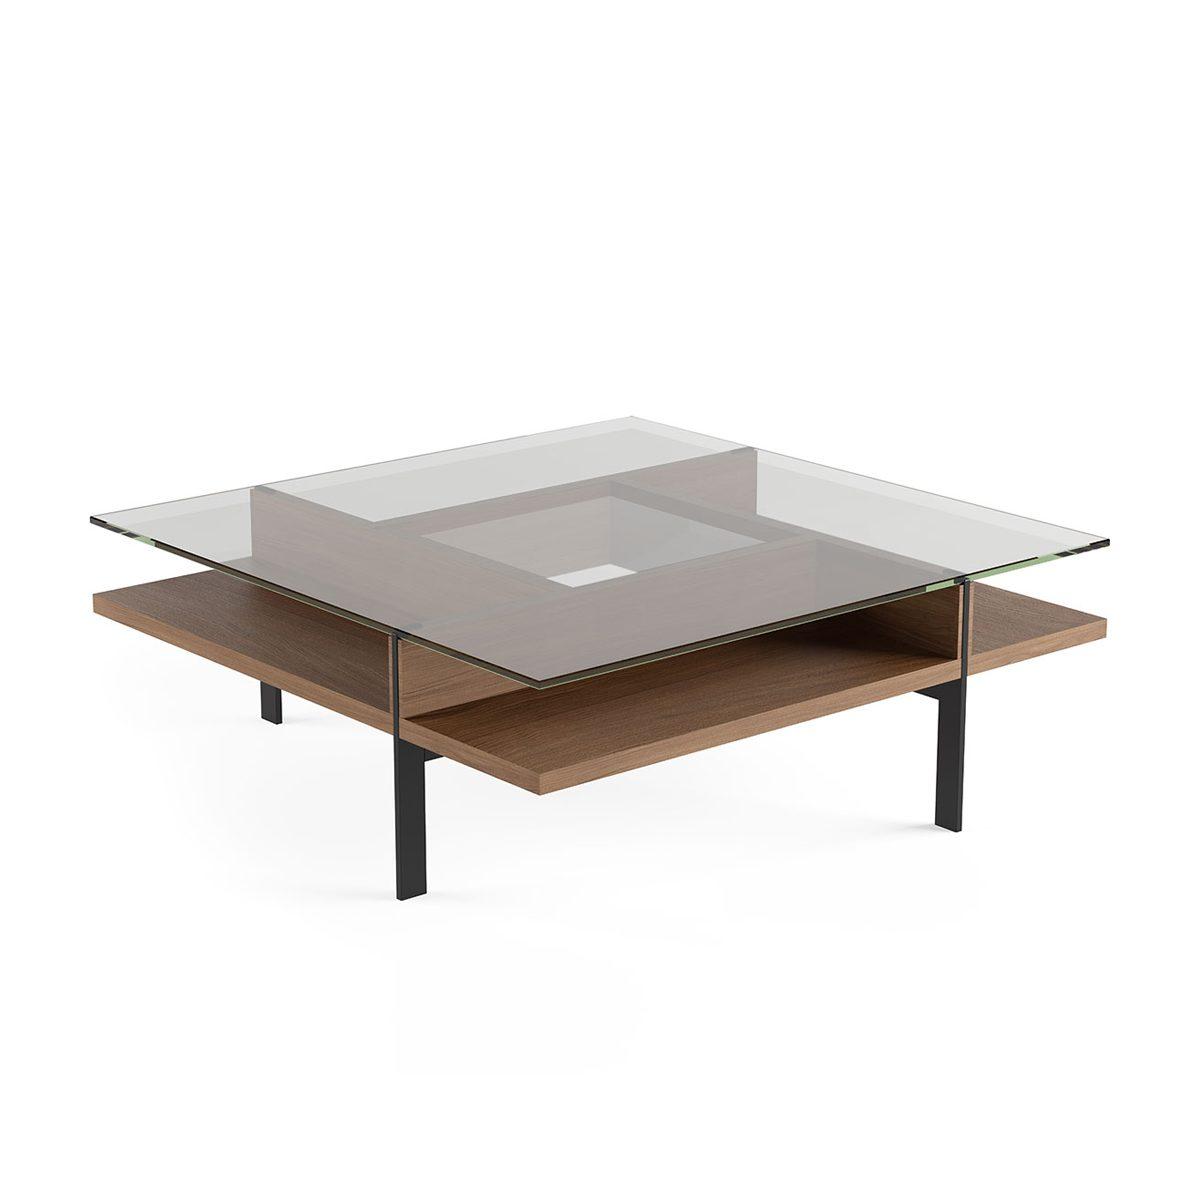 terrace-1150-BDI-square-coffee-table-walnut-1.jpg